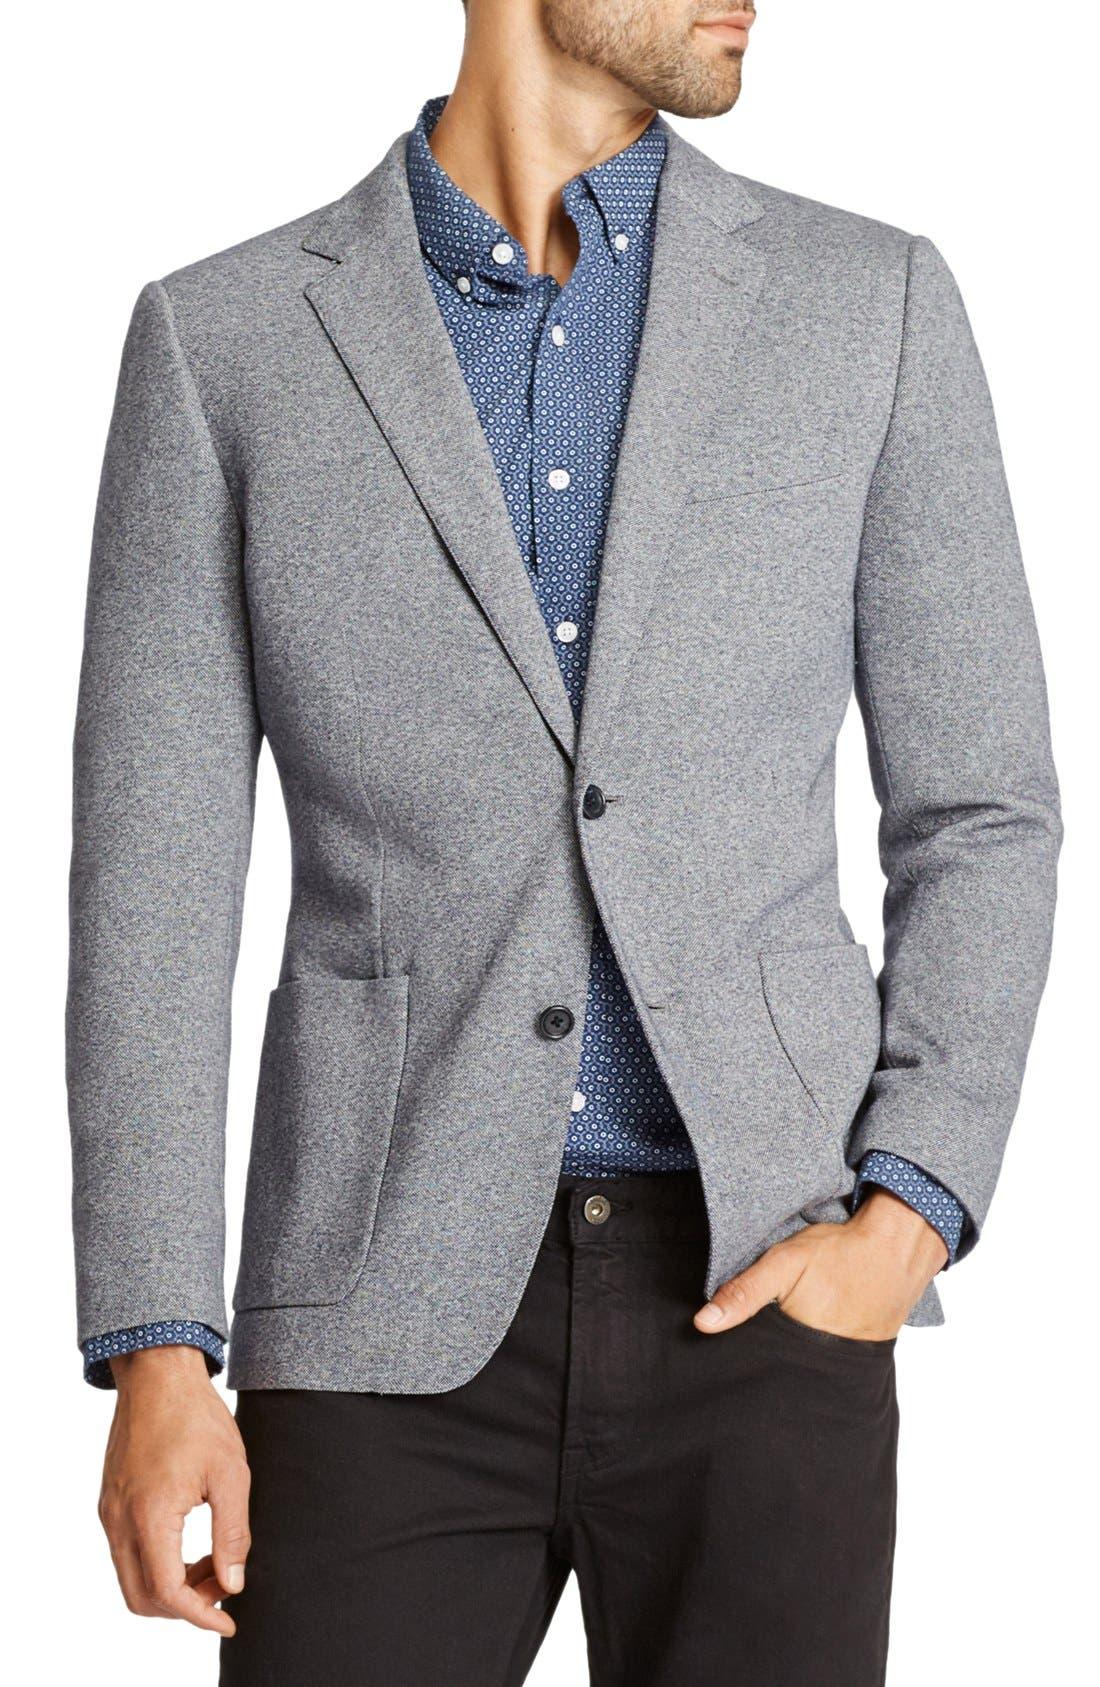 Jetsetter Trim Fit Knit Cotton Blazer,                             Main thumbnail 1, color,                             Light Grey